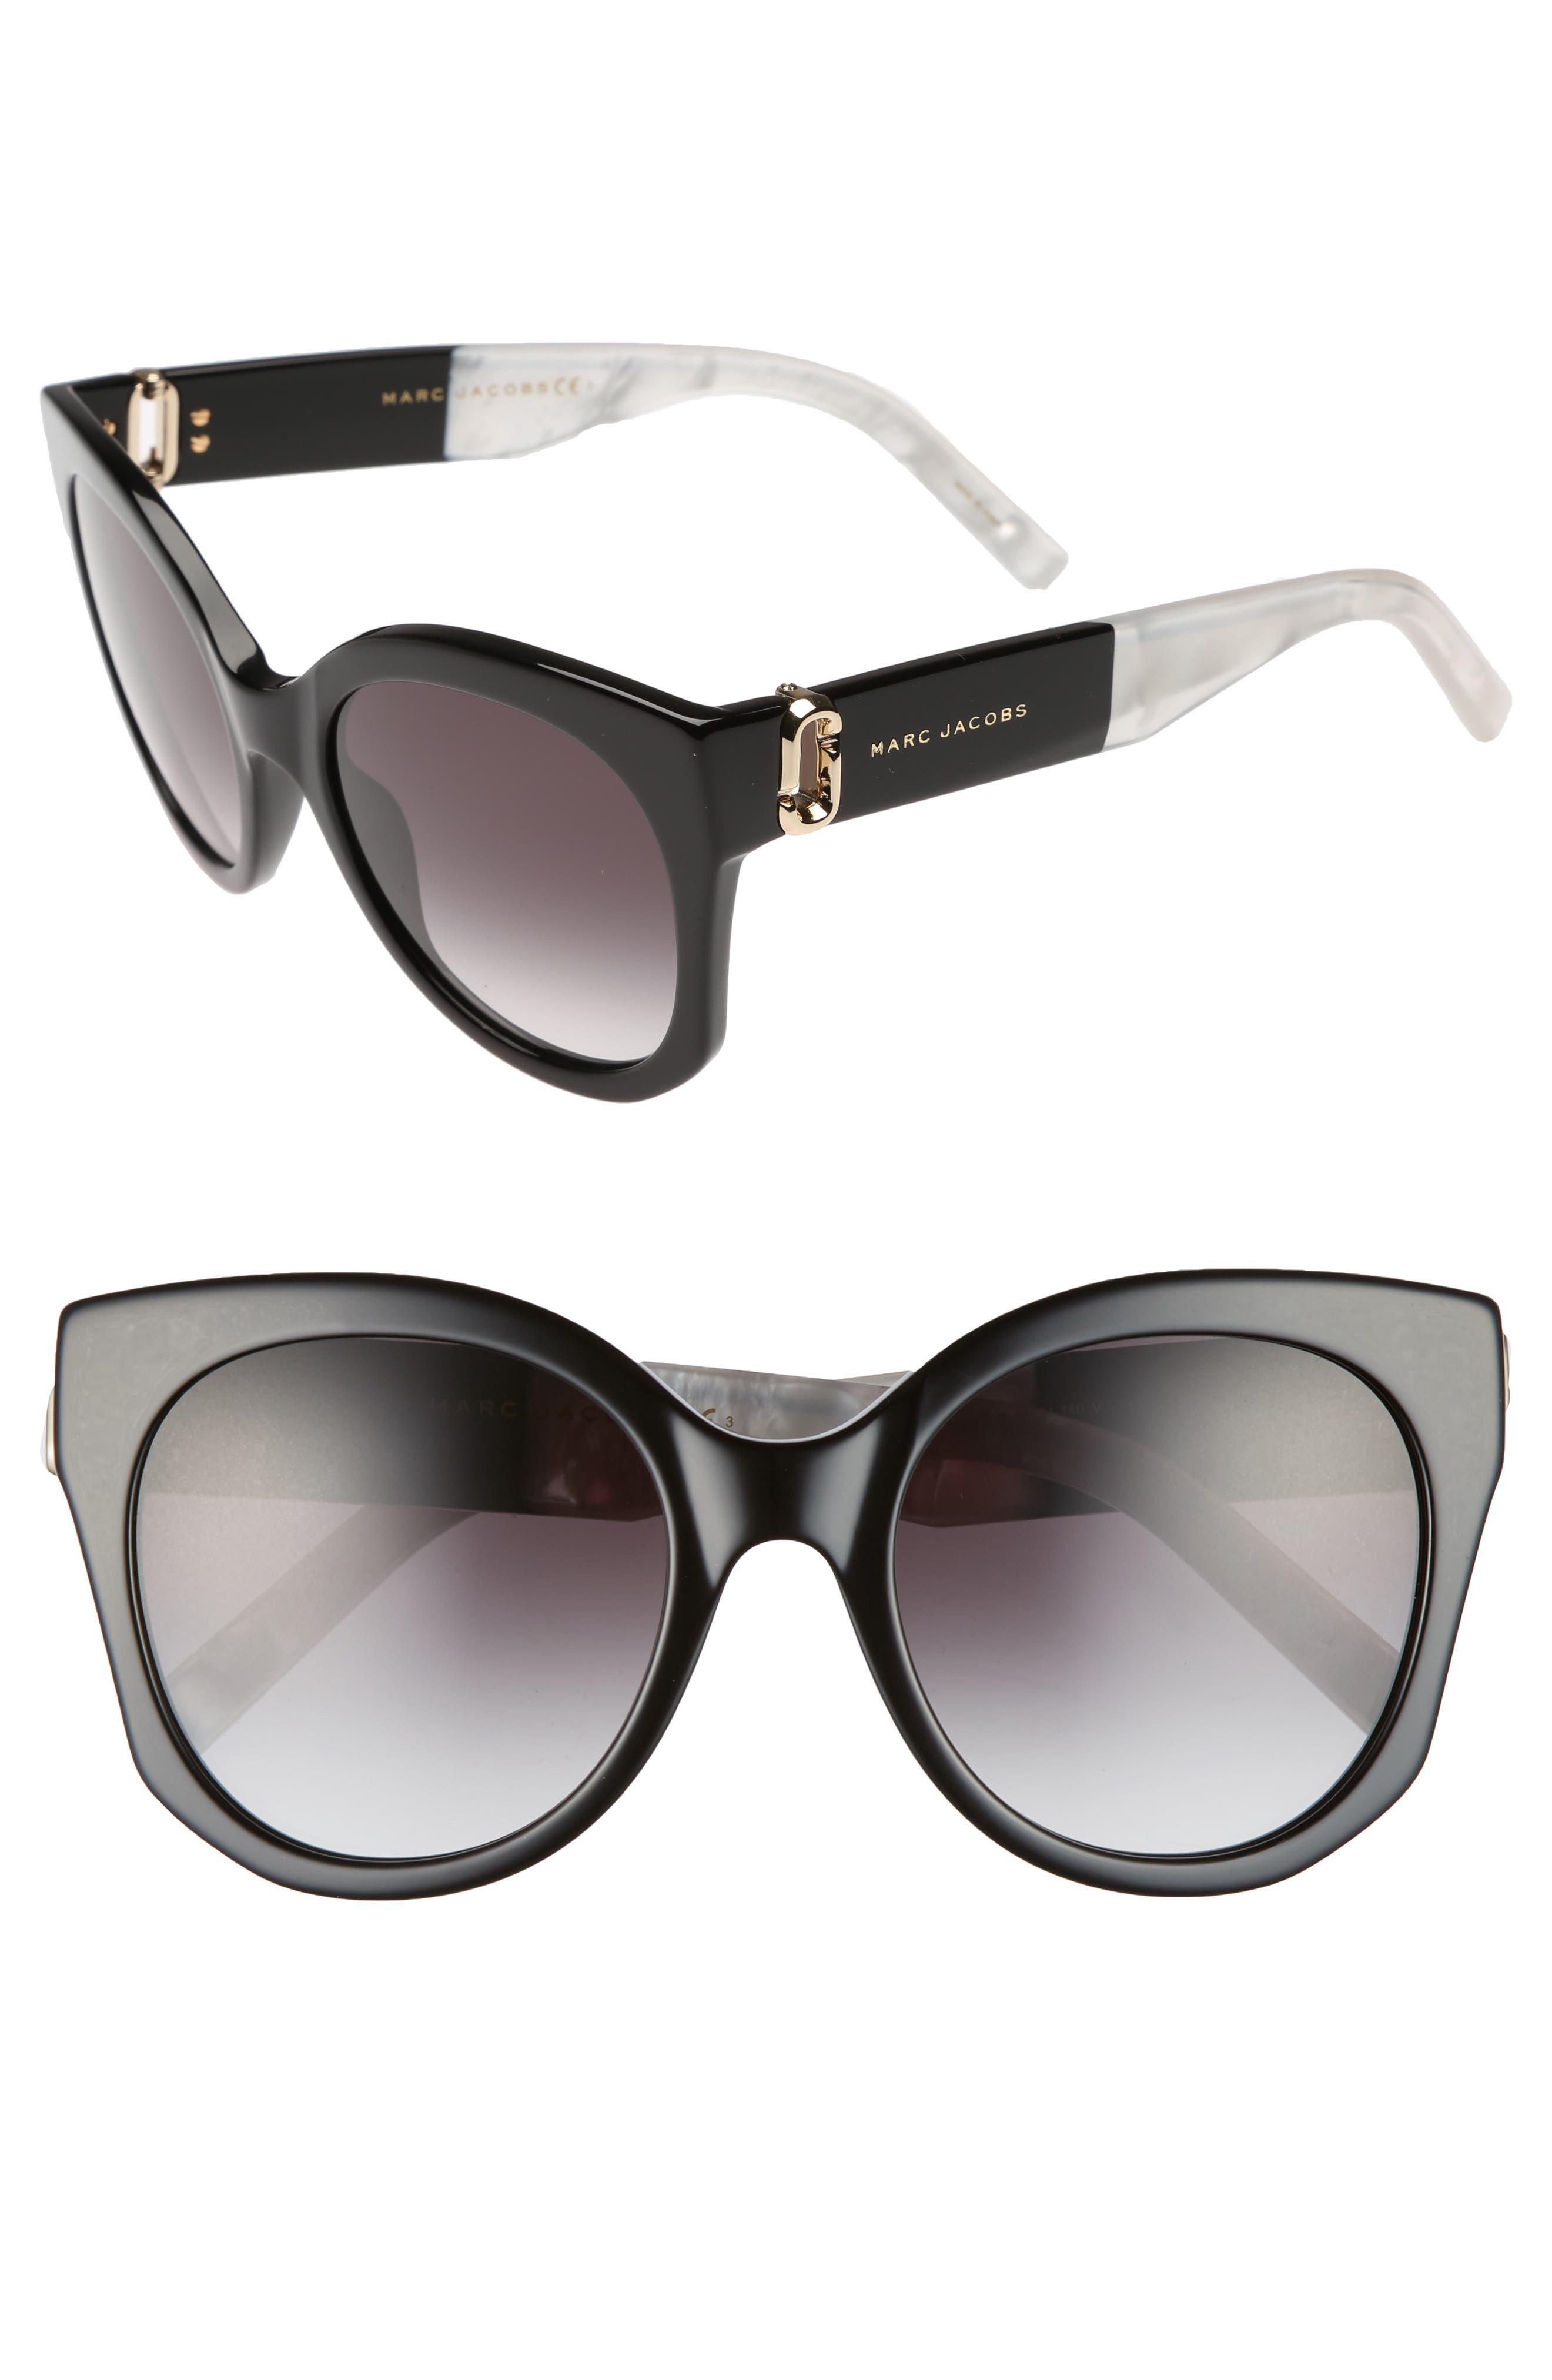 53mm Gradient Lens Cat Eye Sunglasses,                             Main thumbnail 1, color,                             001